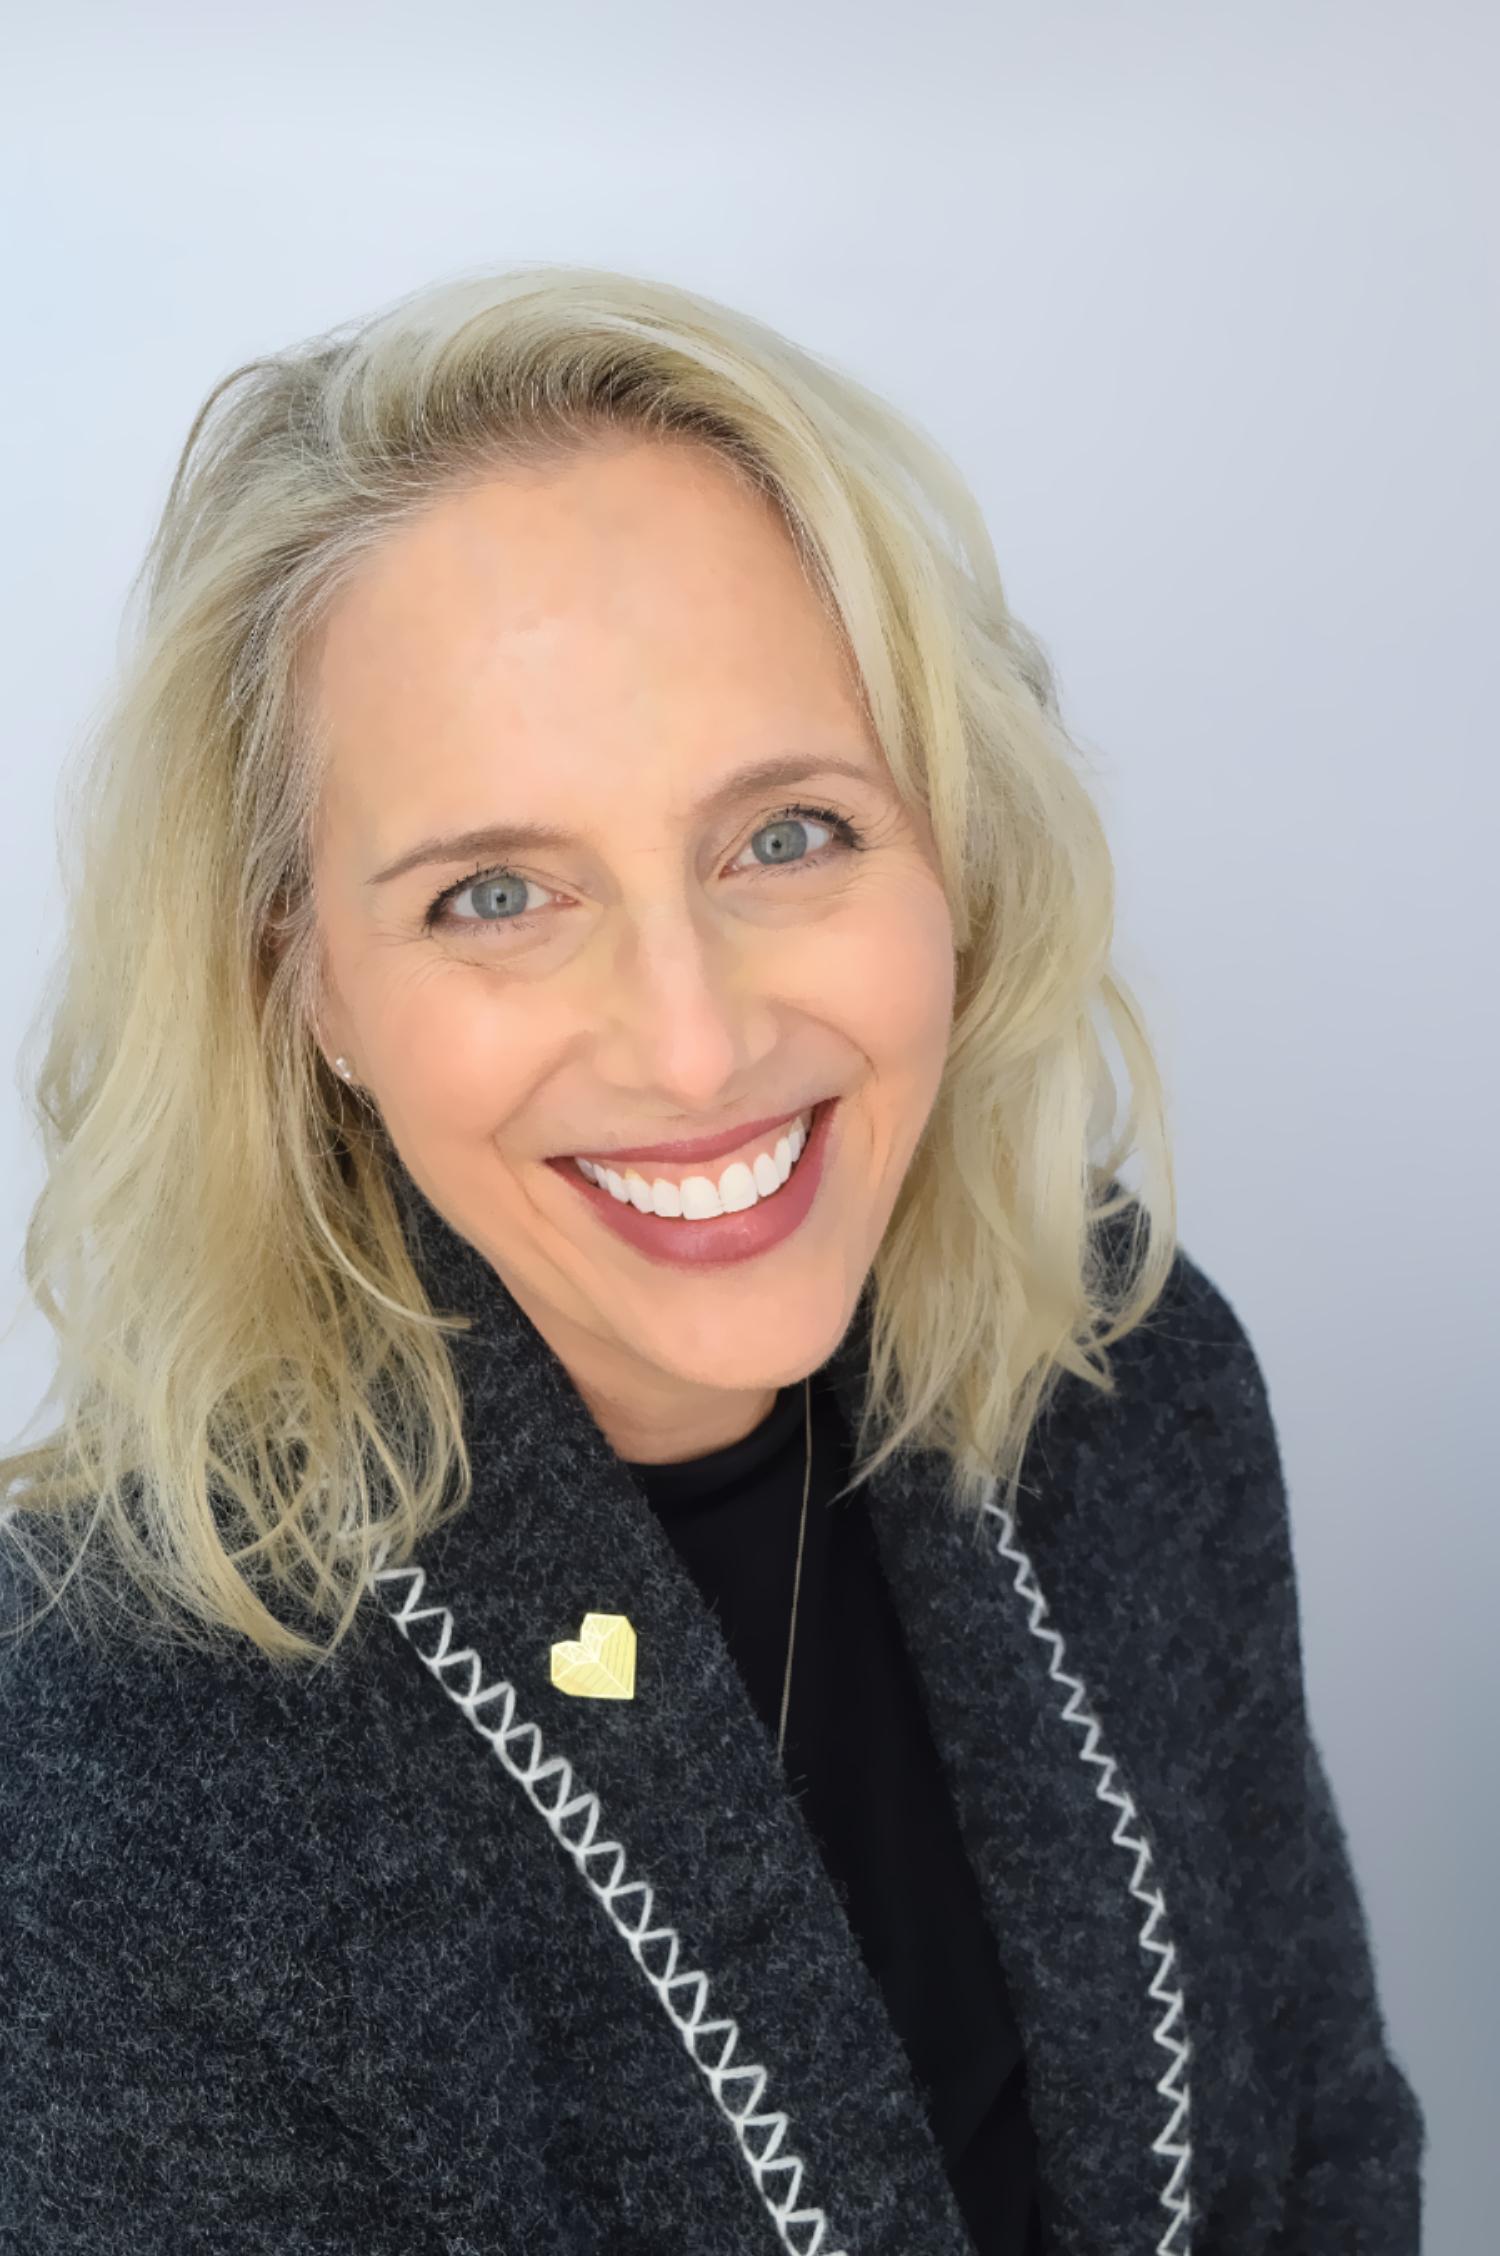 Lindy Yokanovich, Esq. - Founder and Executive Director